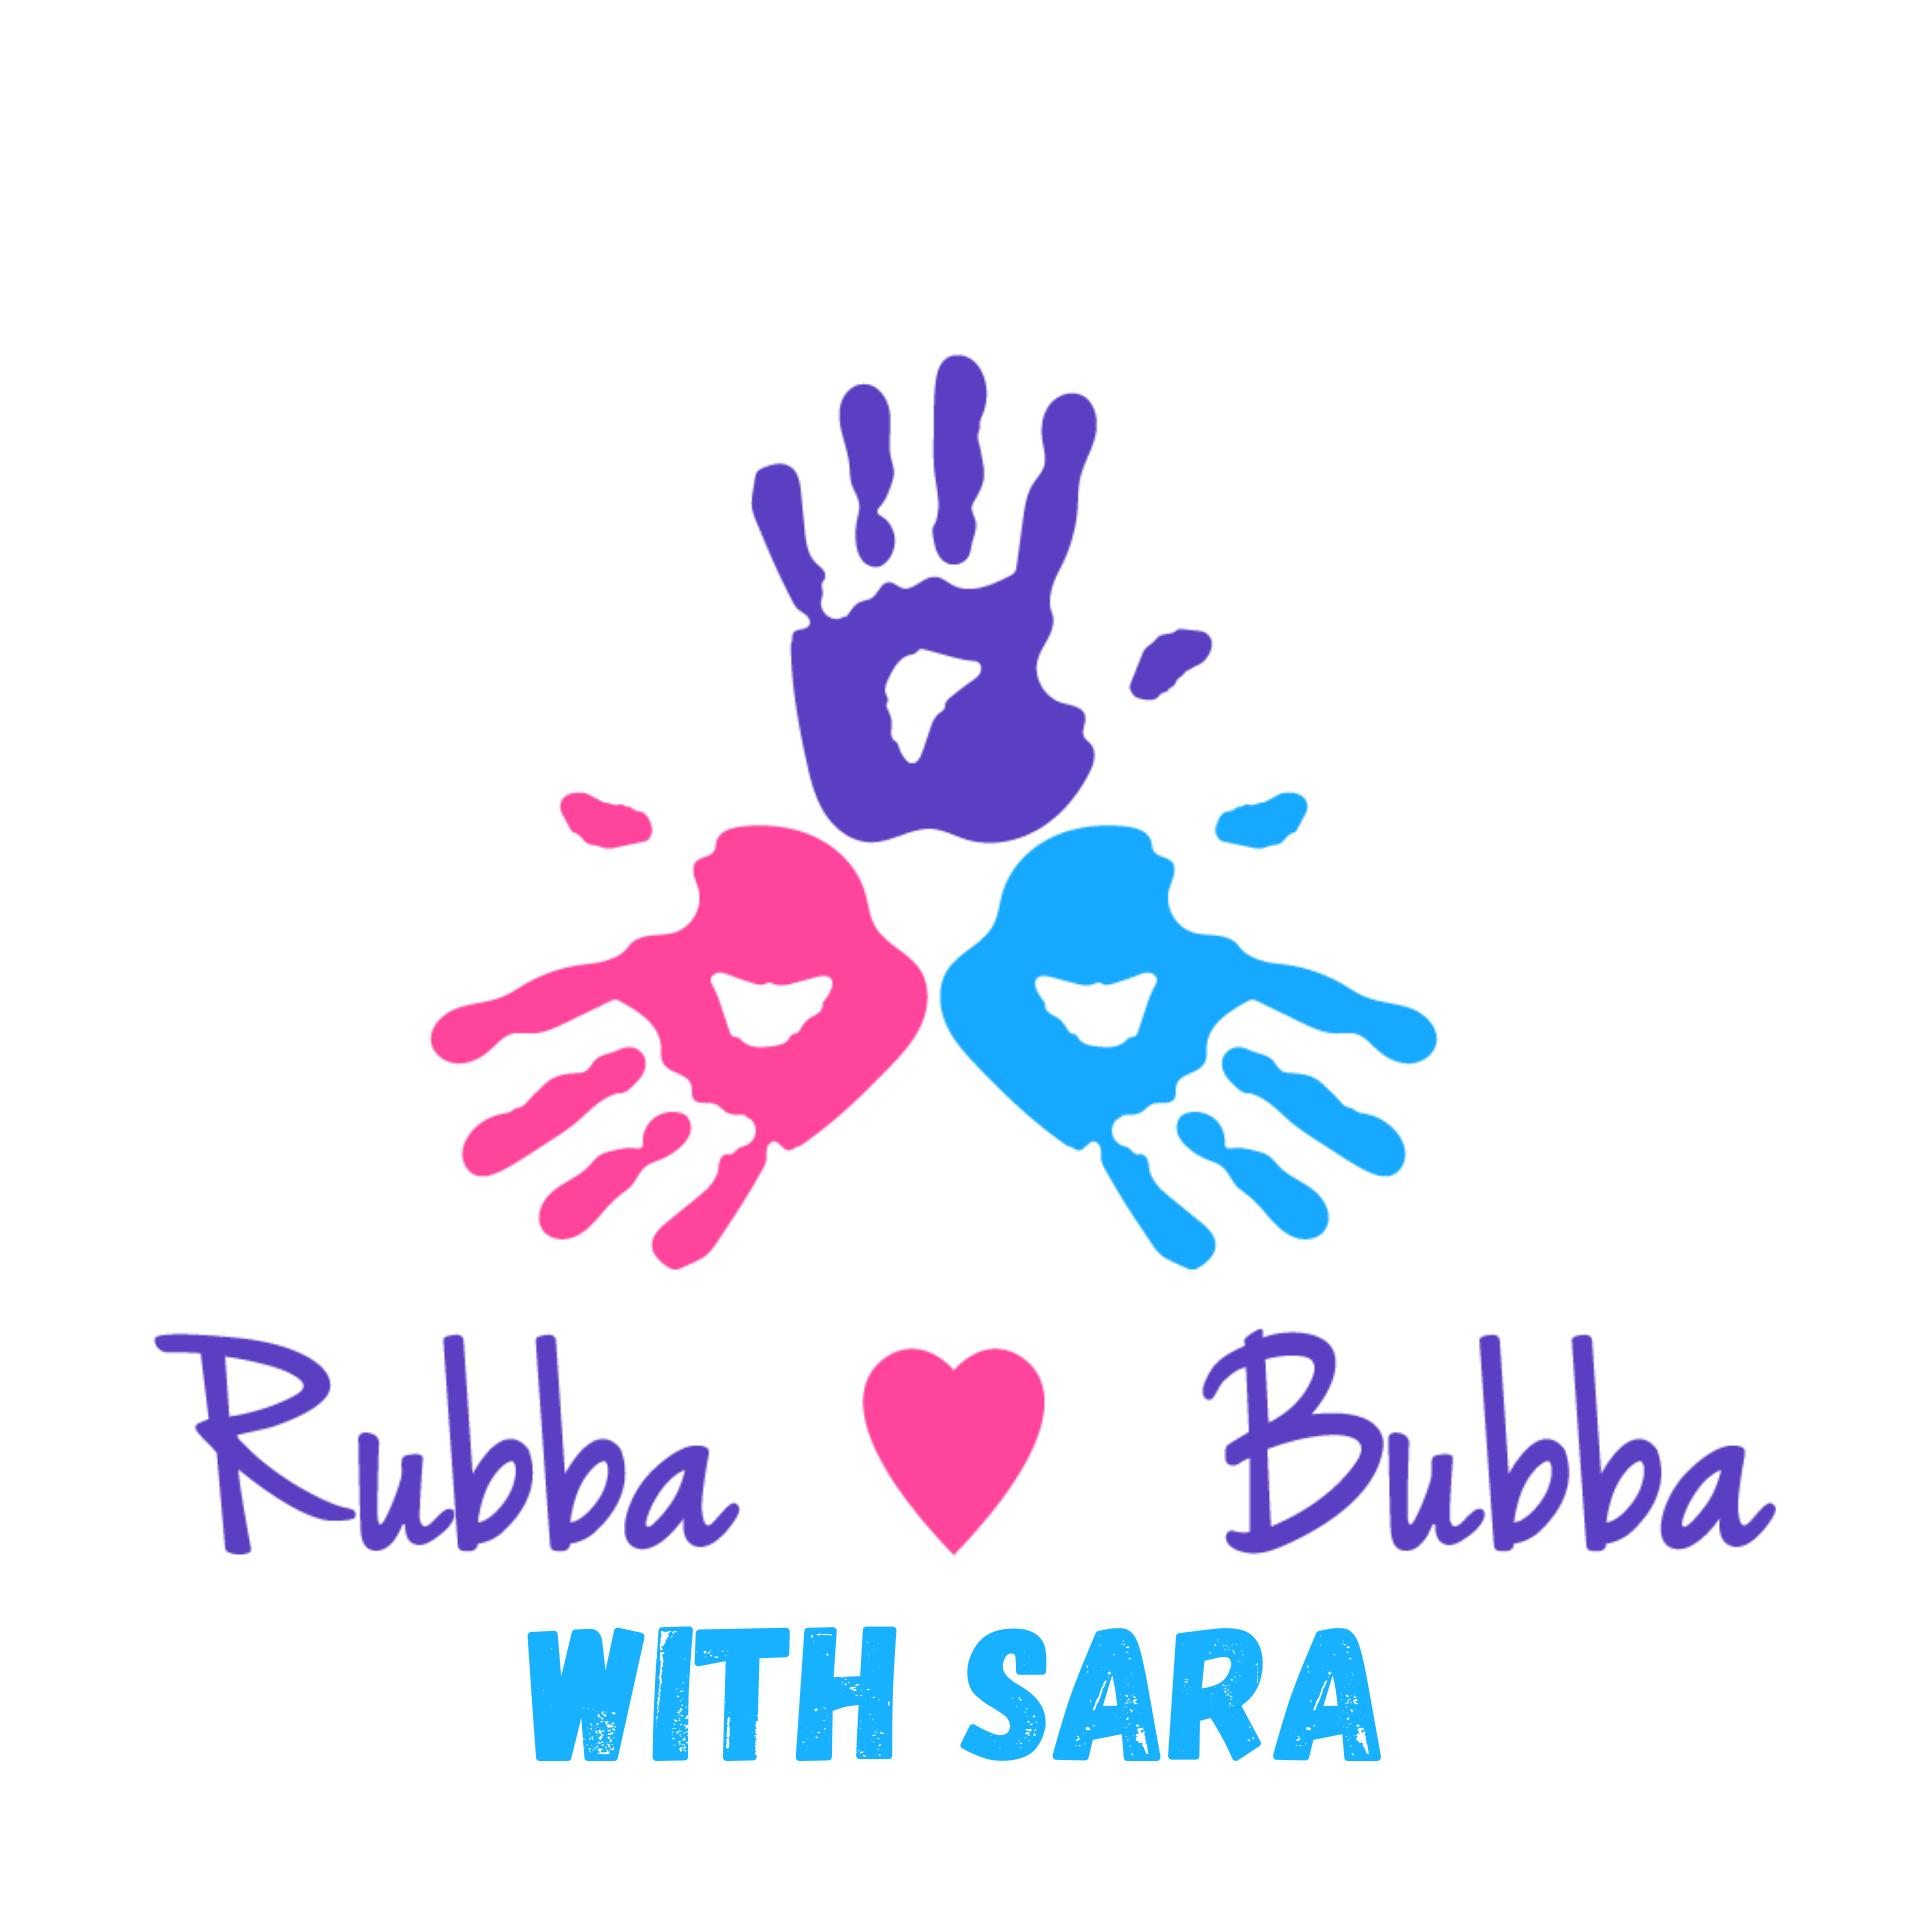 Rubba-Bubba with Sara